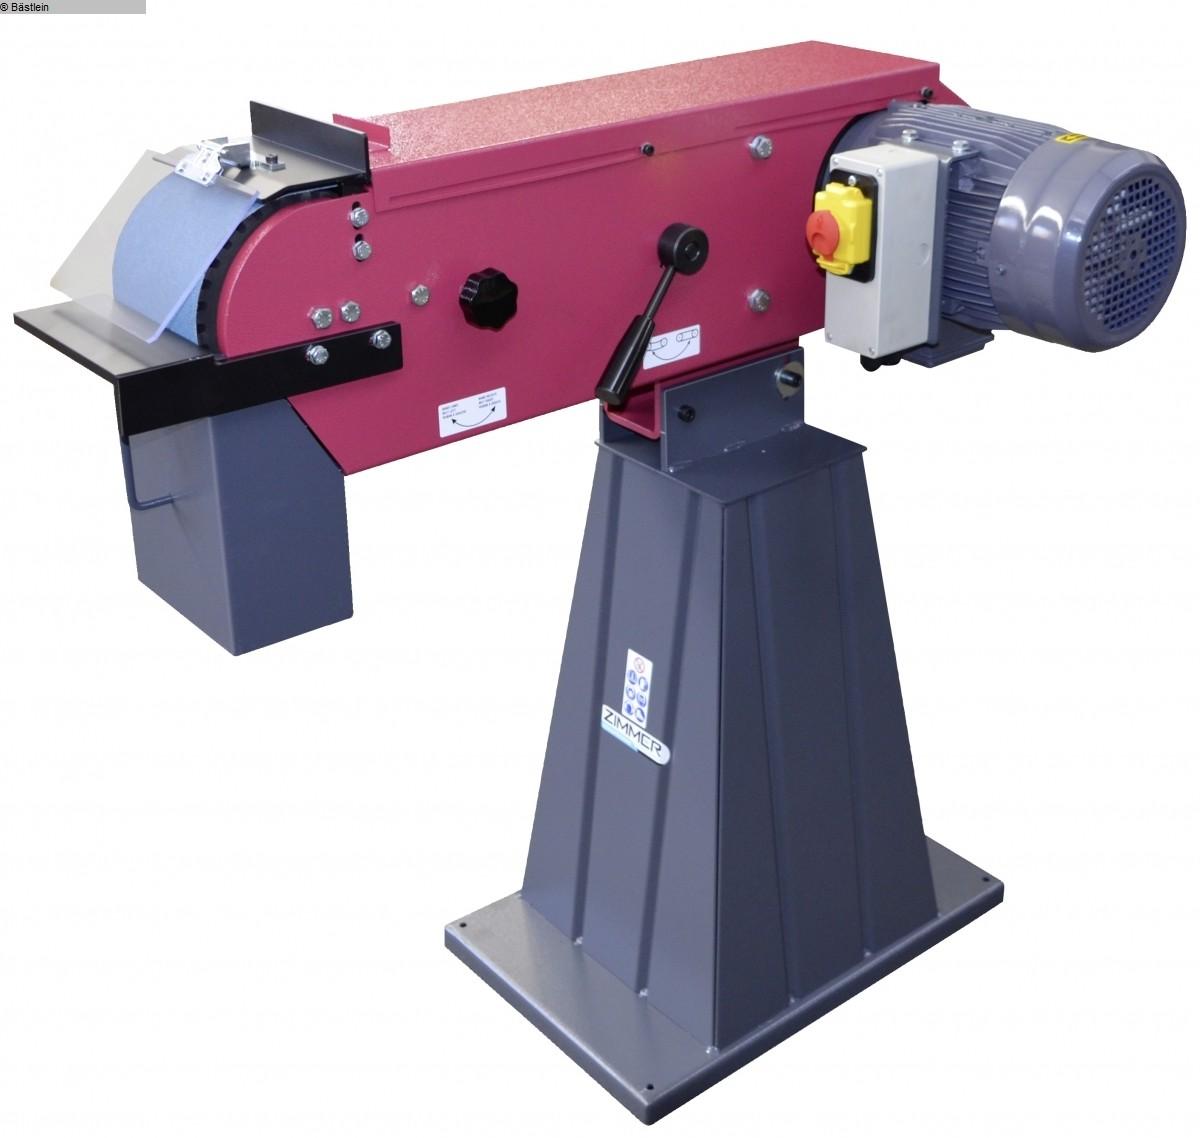 rabljeni Strojevi za mljevenje Stroj za mljevenje remena ZIMMER Panther Super 150 / 2 / 4